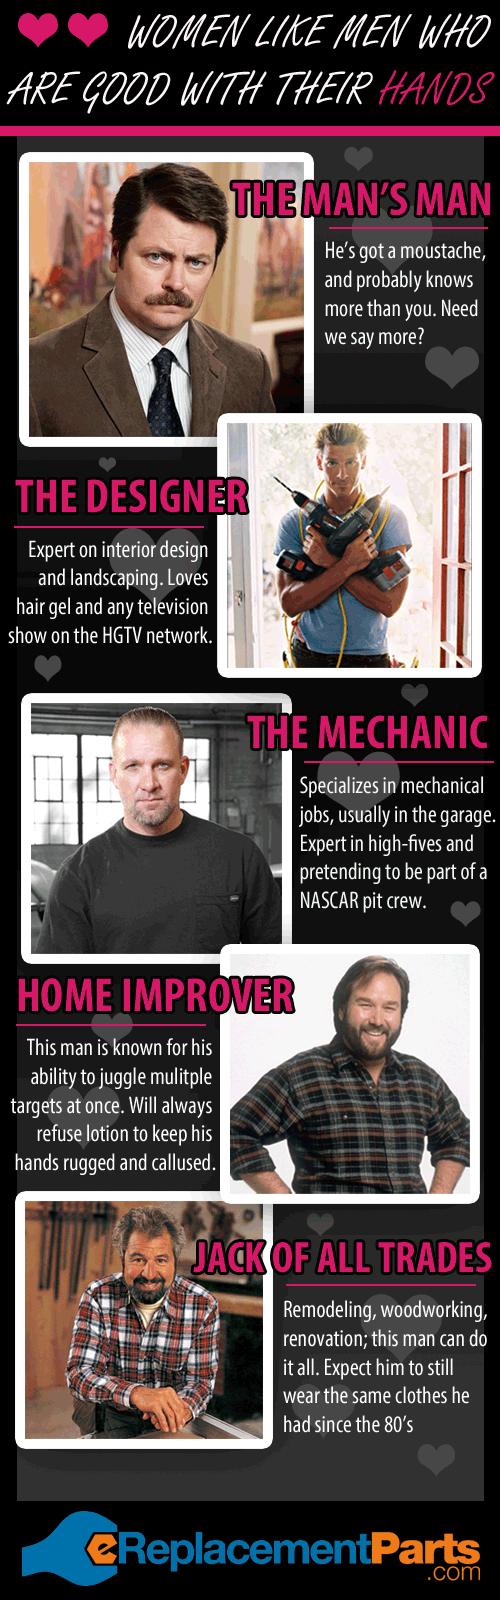 handy man infographic women - 7047129856